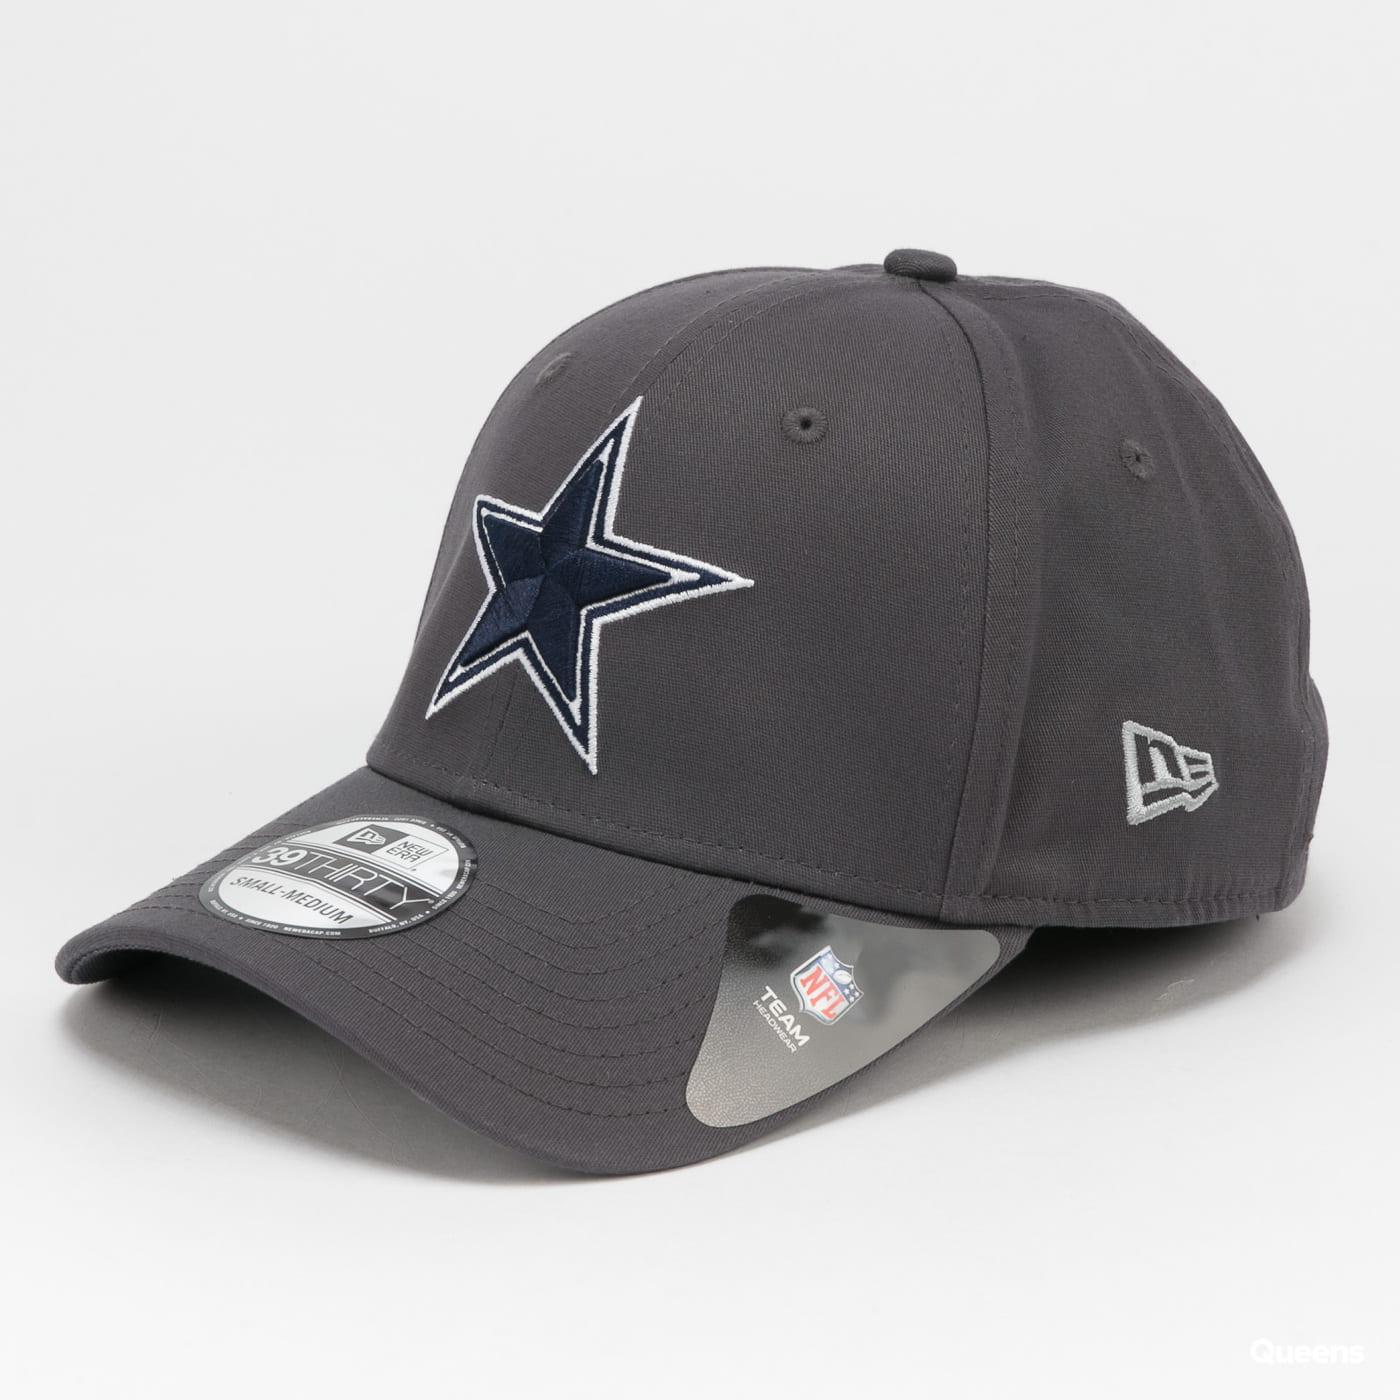 New Era 3930 NFL Team Dallas Cowboys tmavě šedá